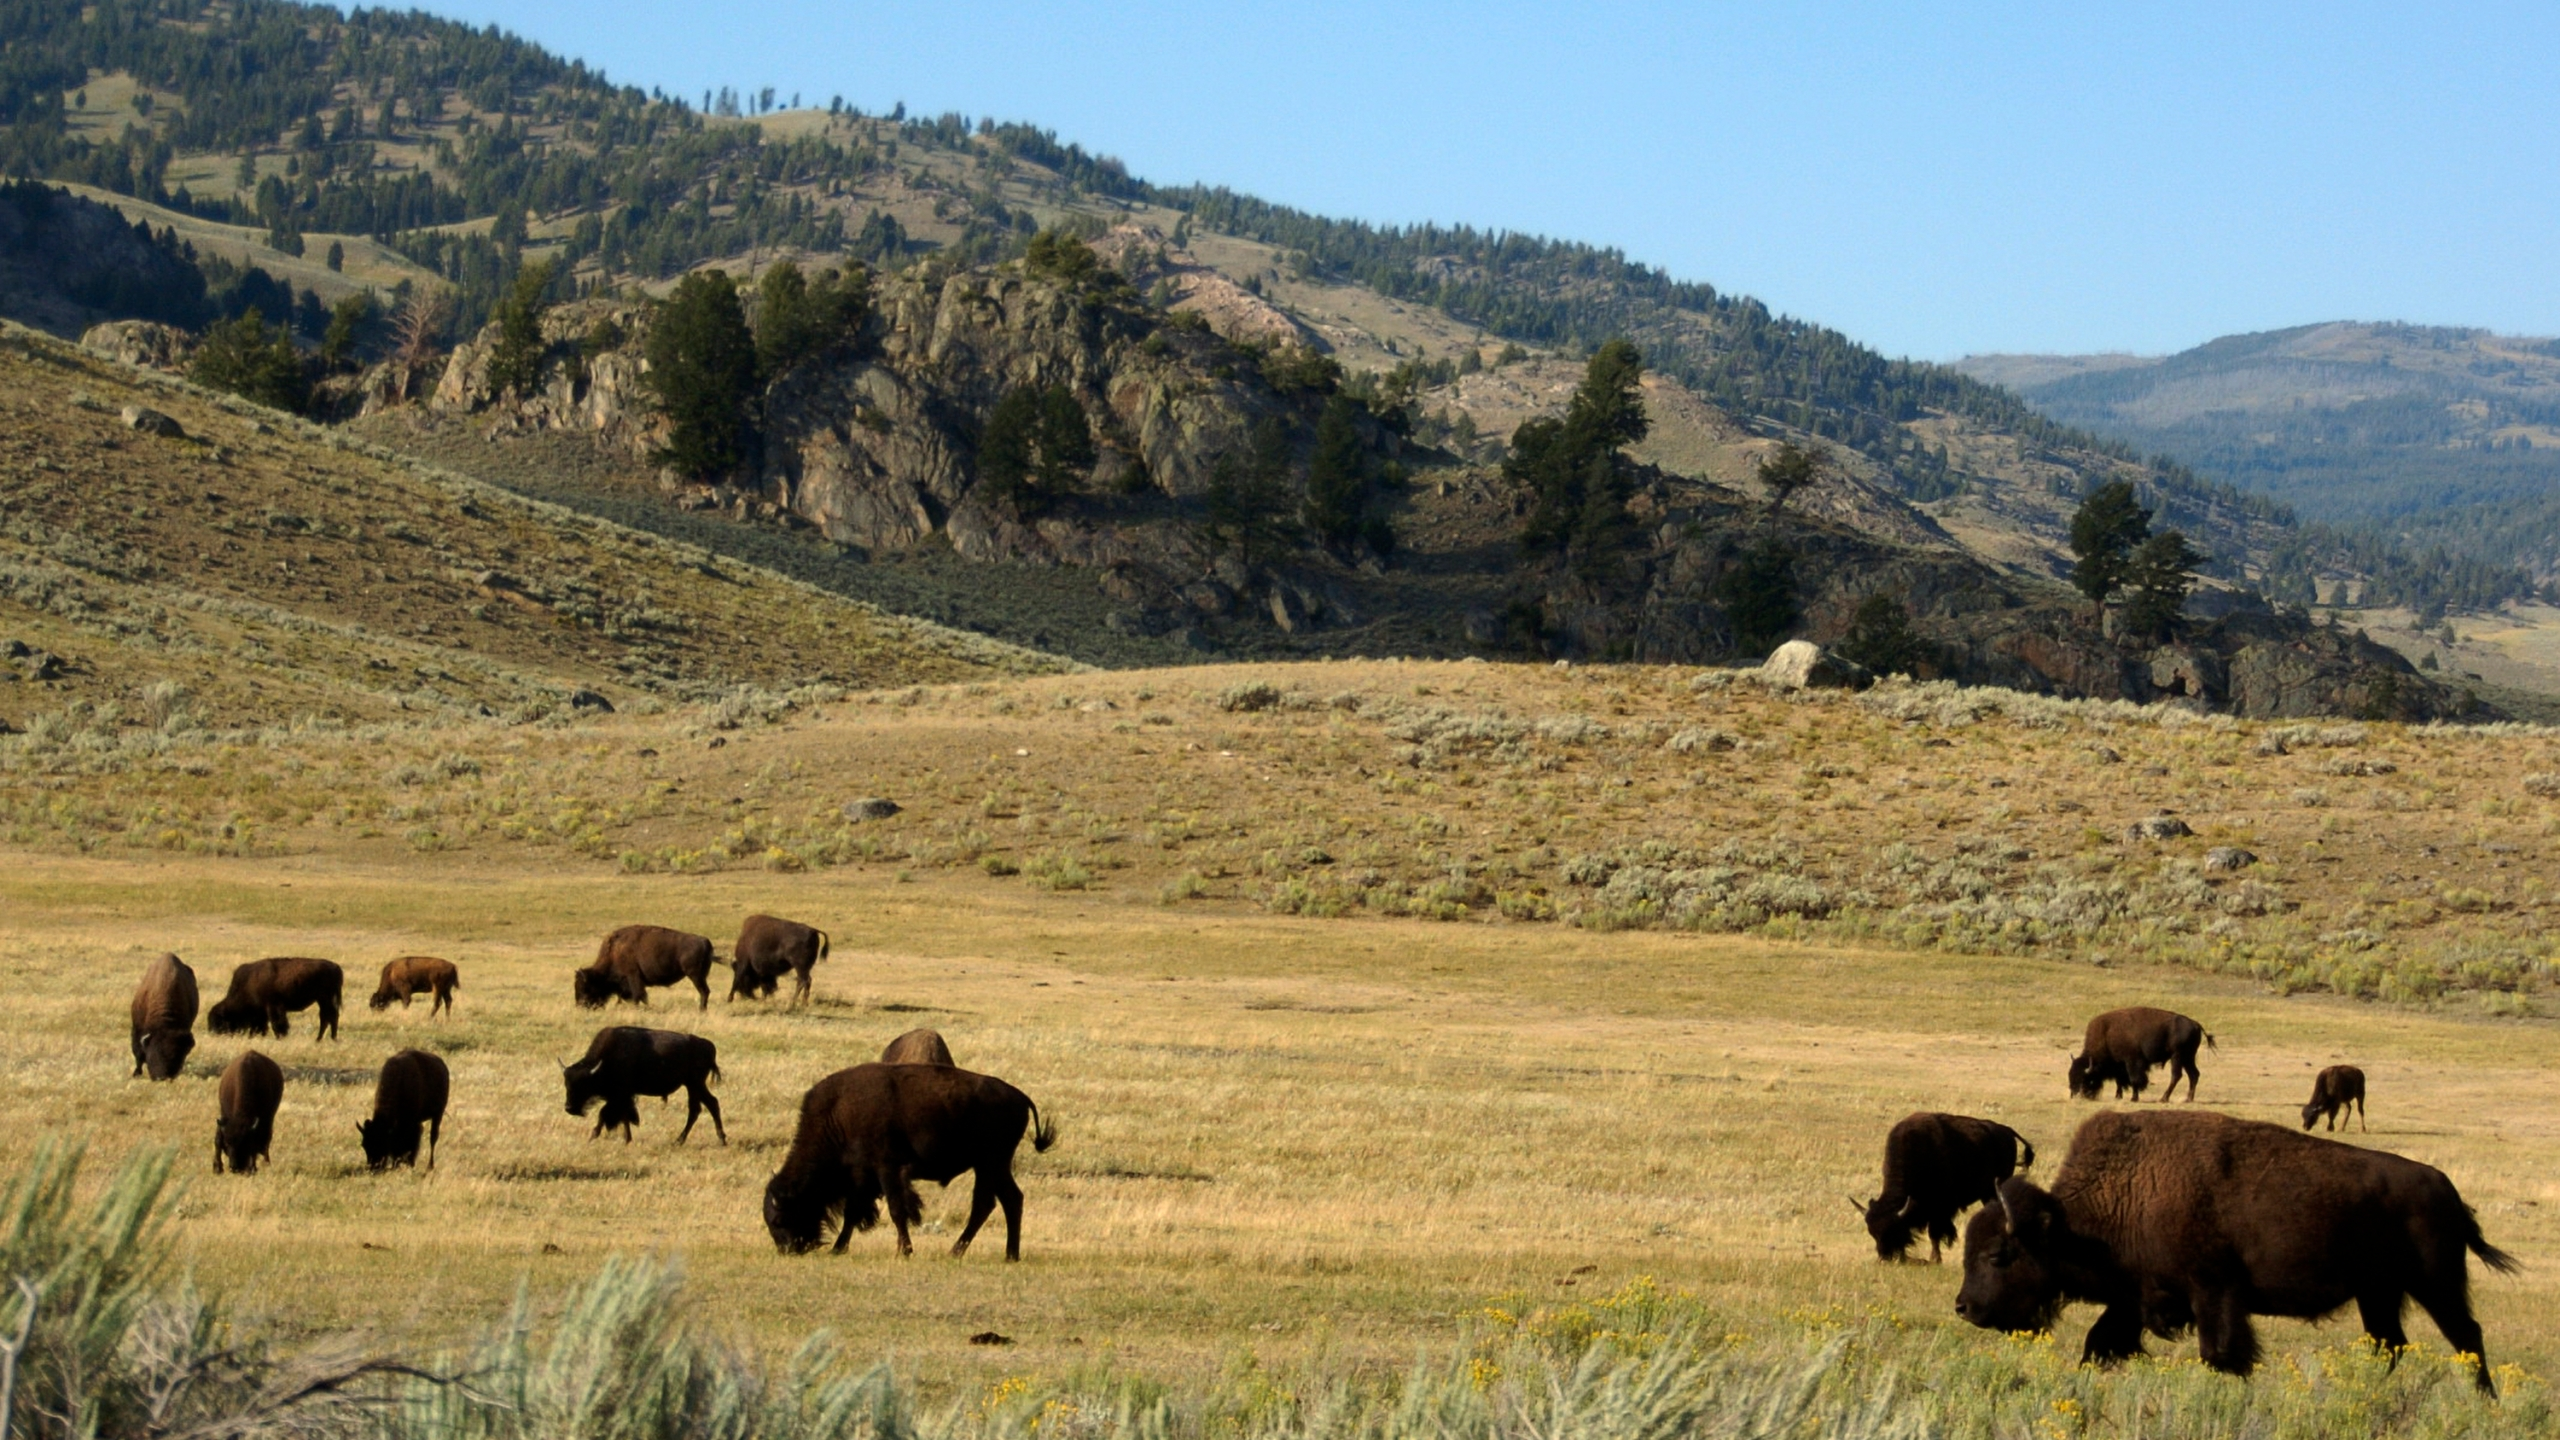 Yellowstone_Bison_Harassment_52189-159532.jpg24242909